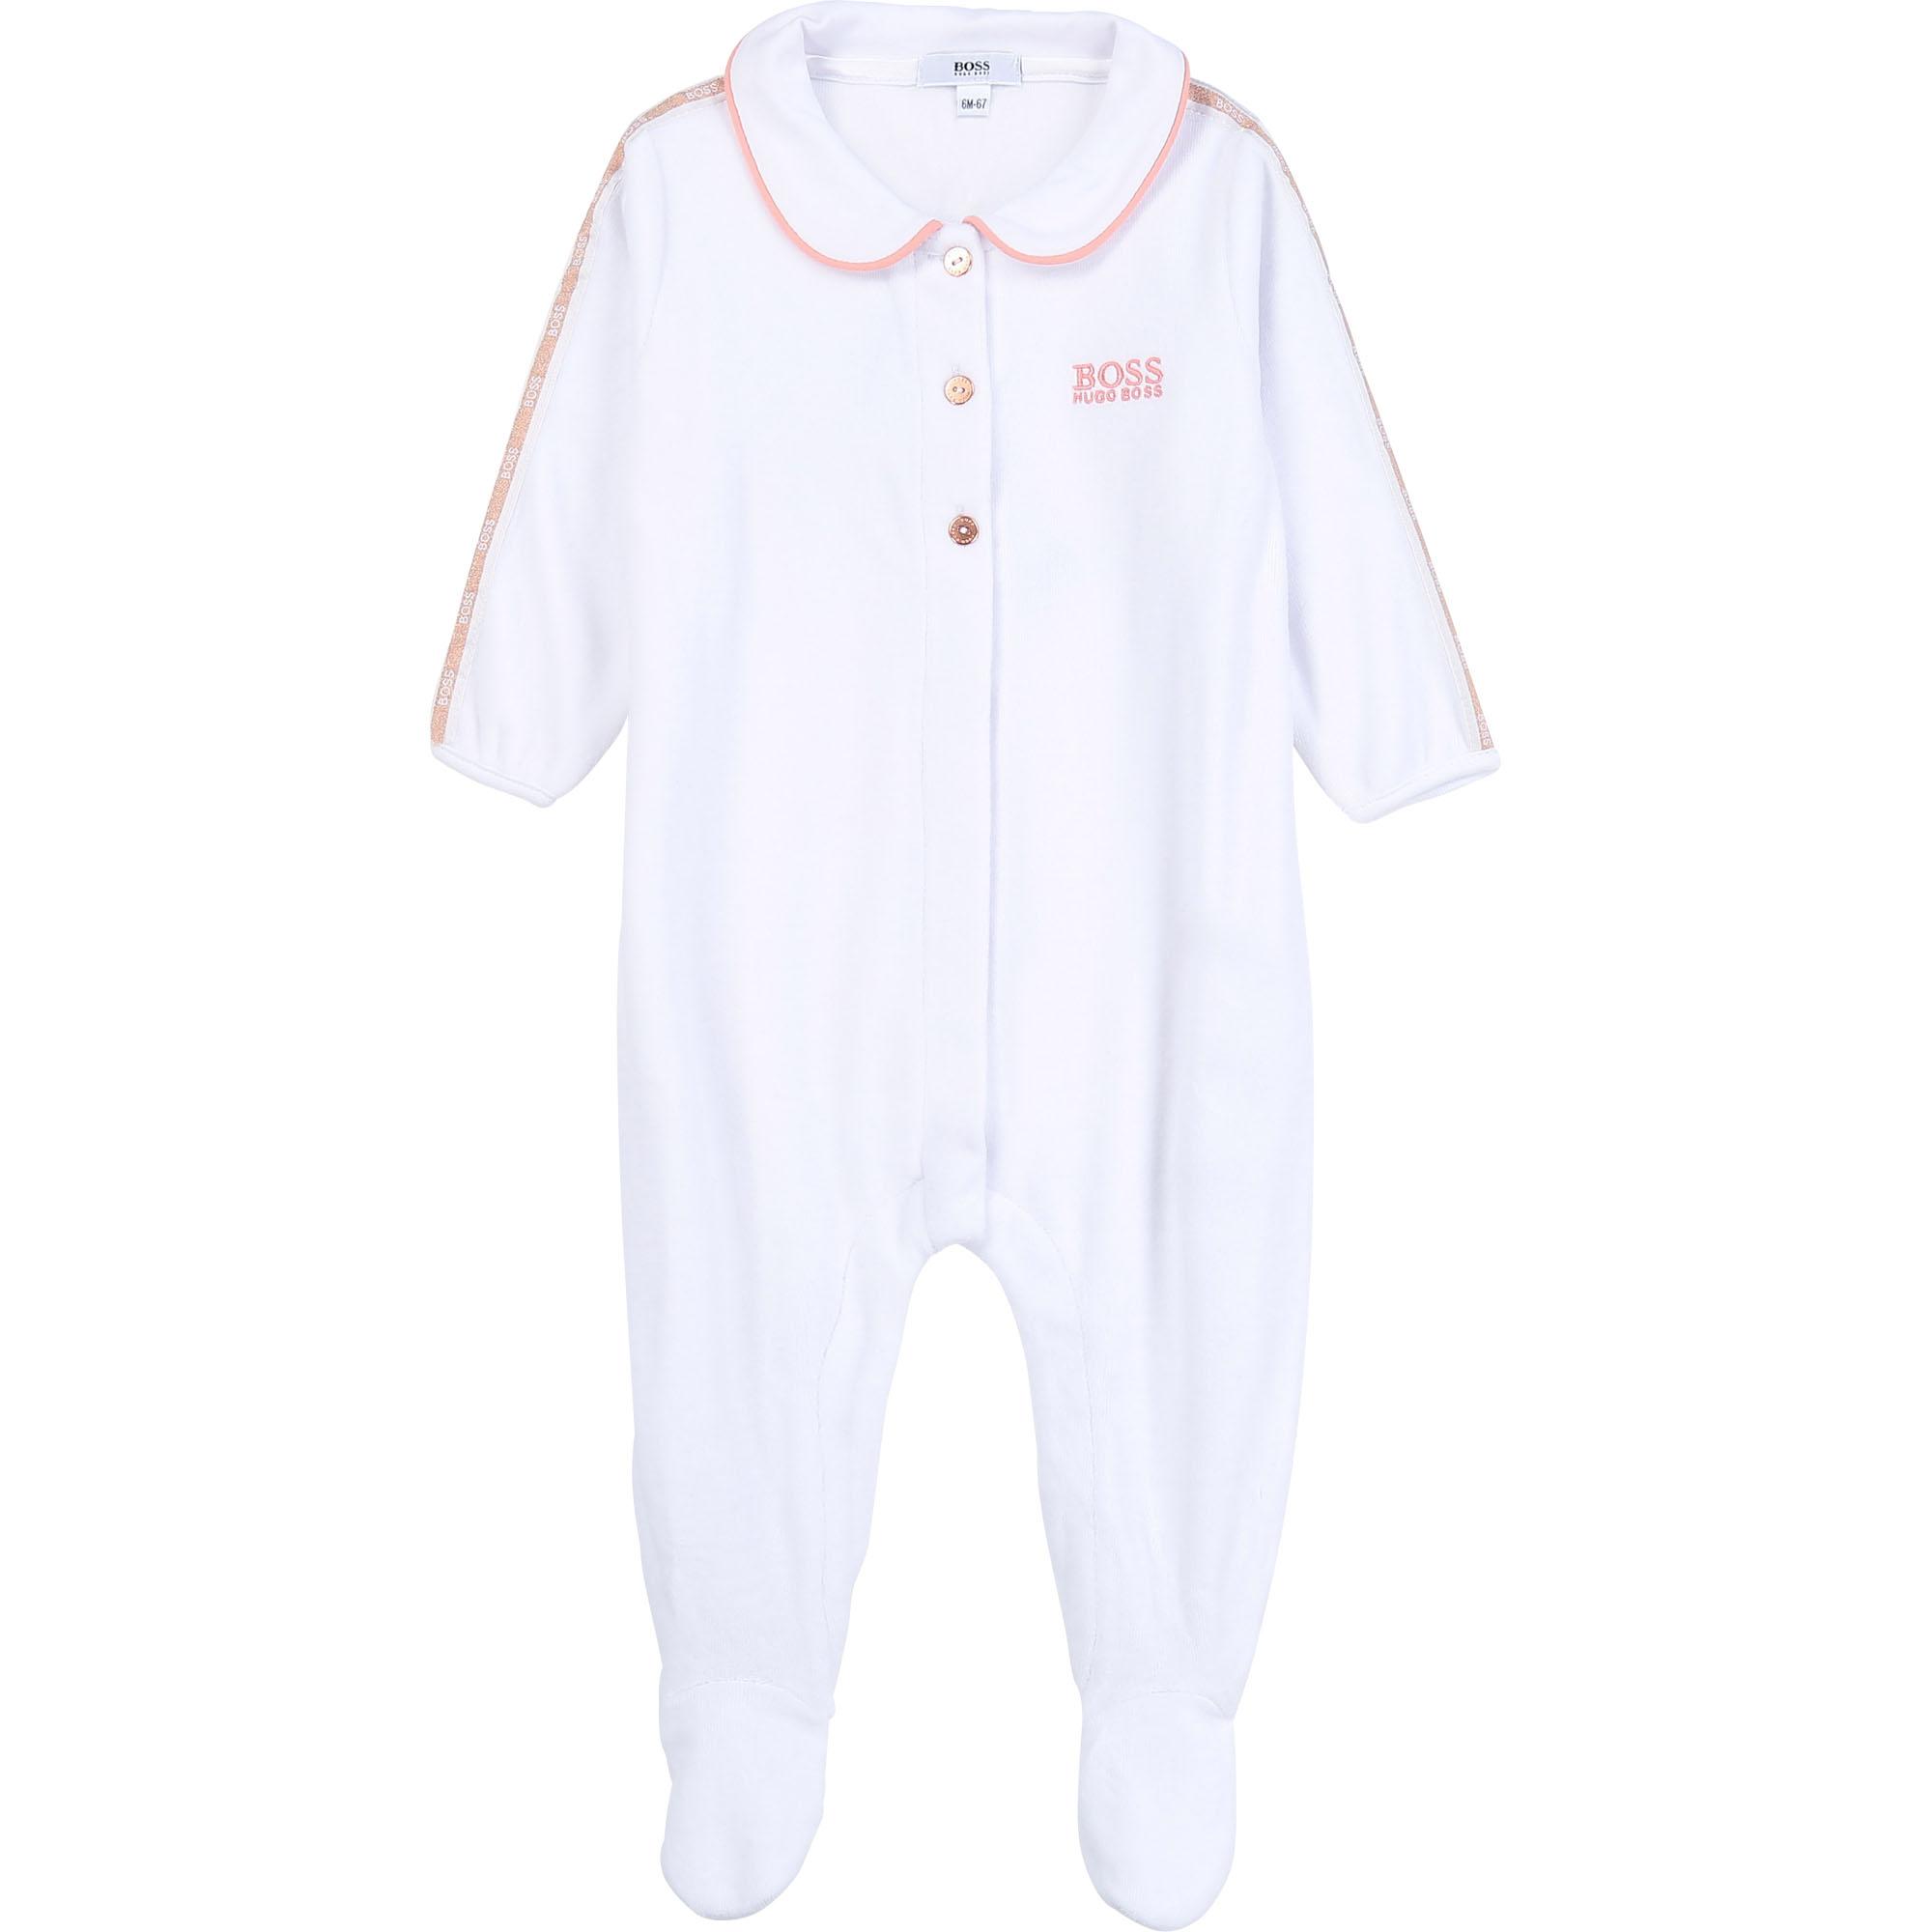 Pyjama en velours BOSS BEBE COUCHE FILLE Blanc